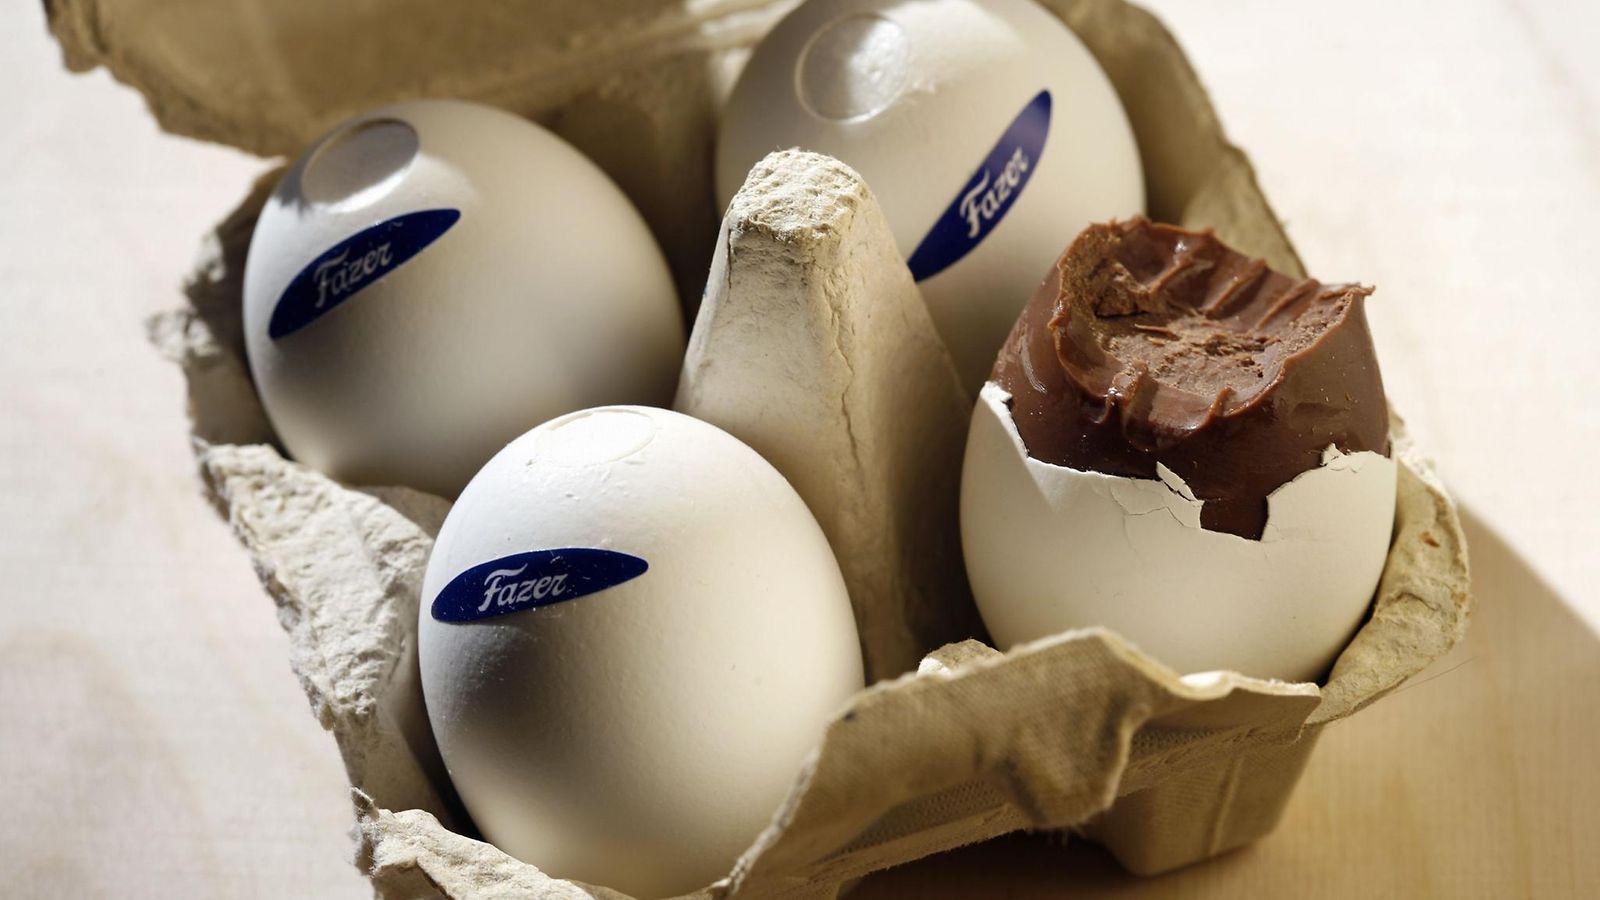 teini saa valtavan munaa